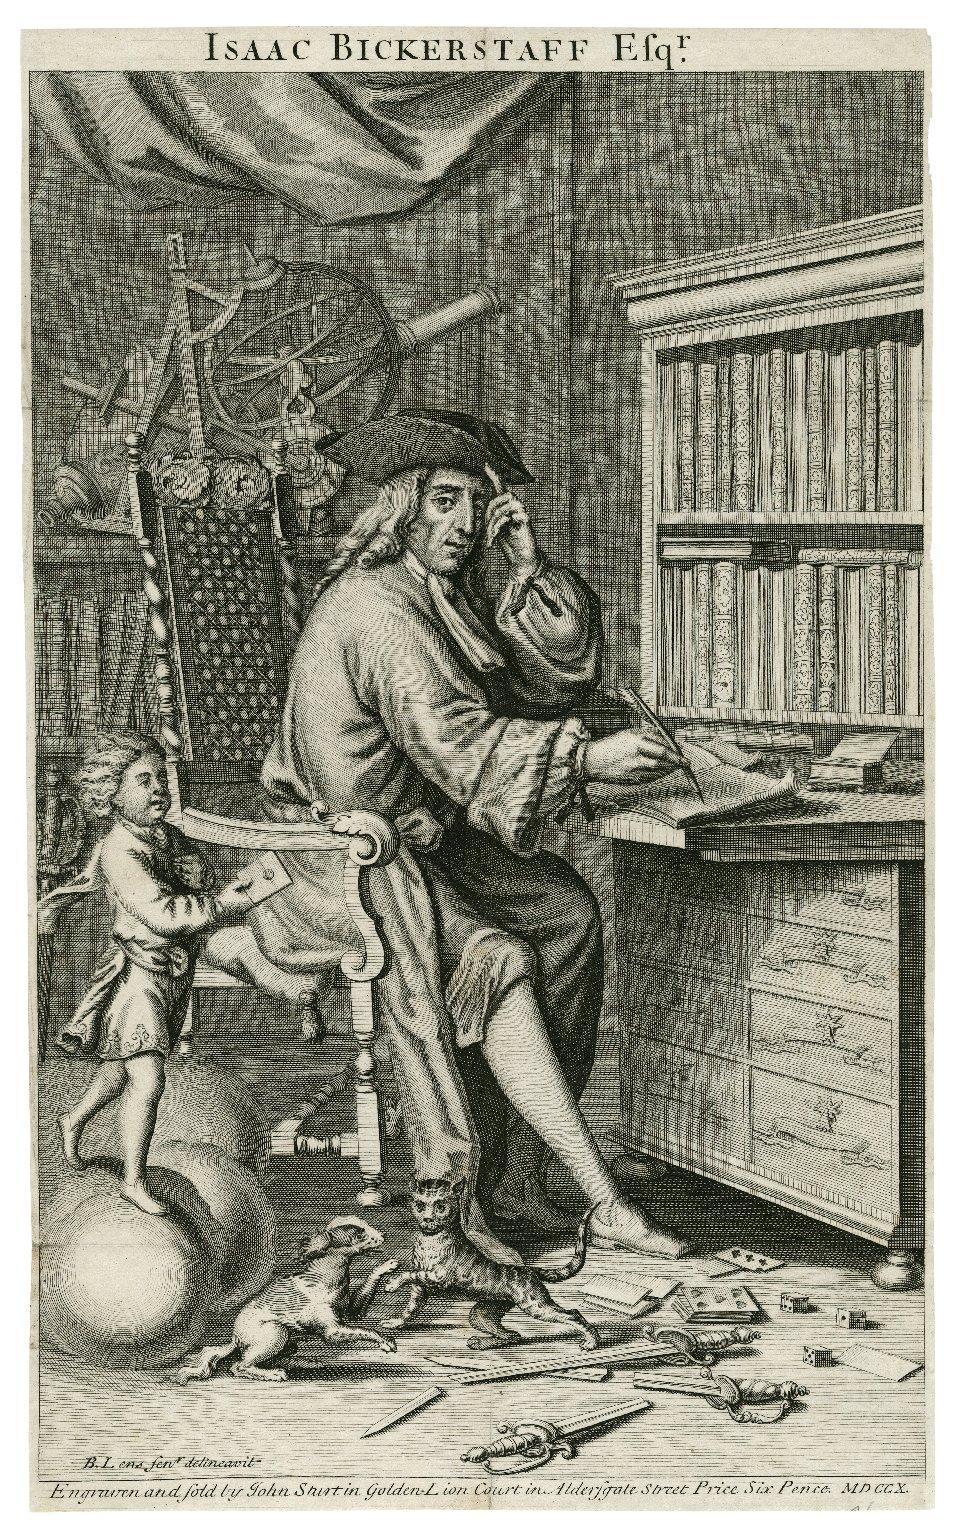 Isaac Bickerstaff Esqr. [graphic] / B. Lens senr., delineavit ; engraven by John Sturt.